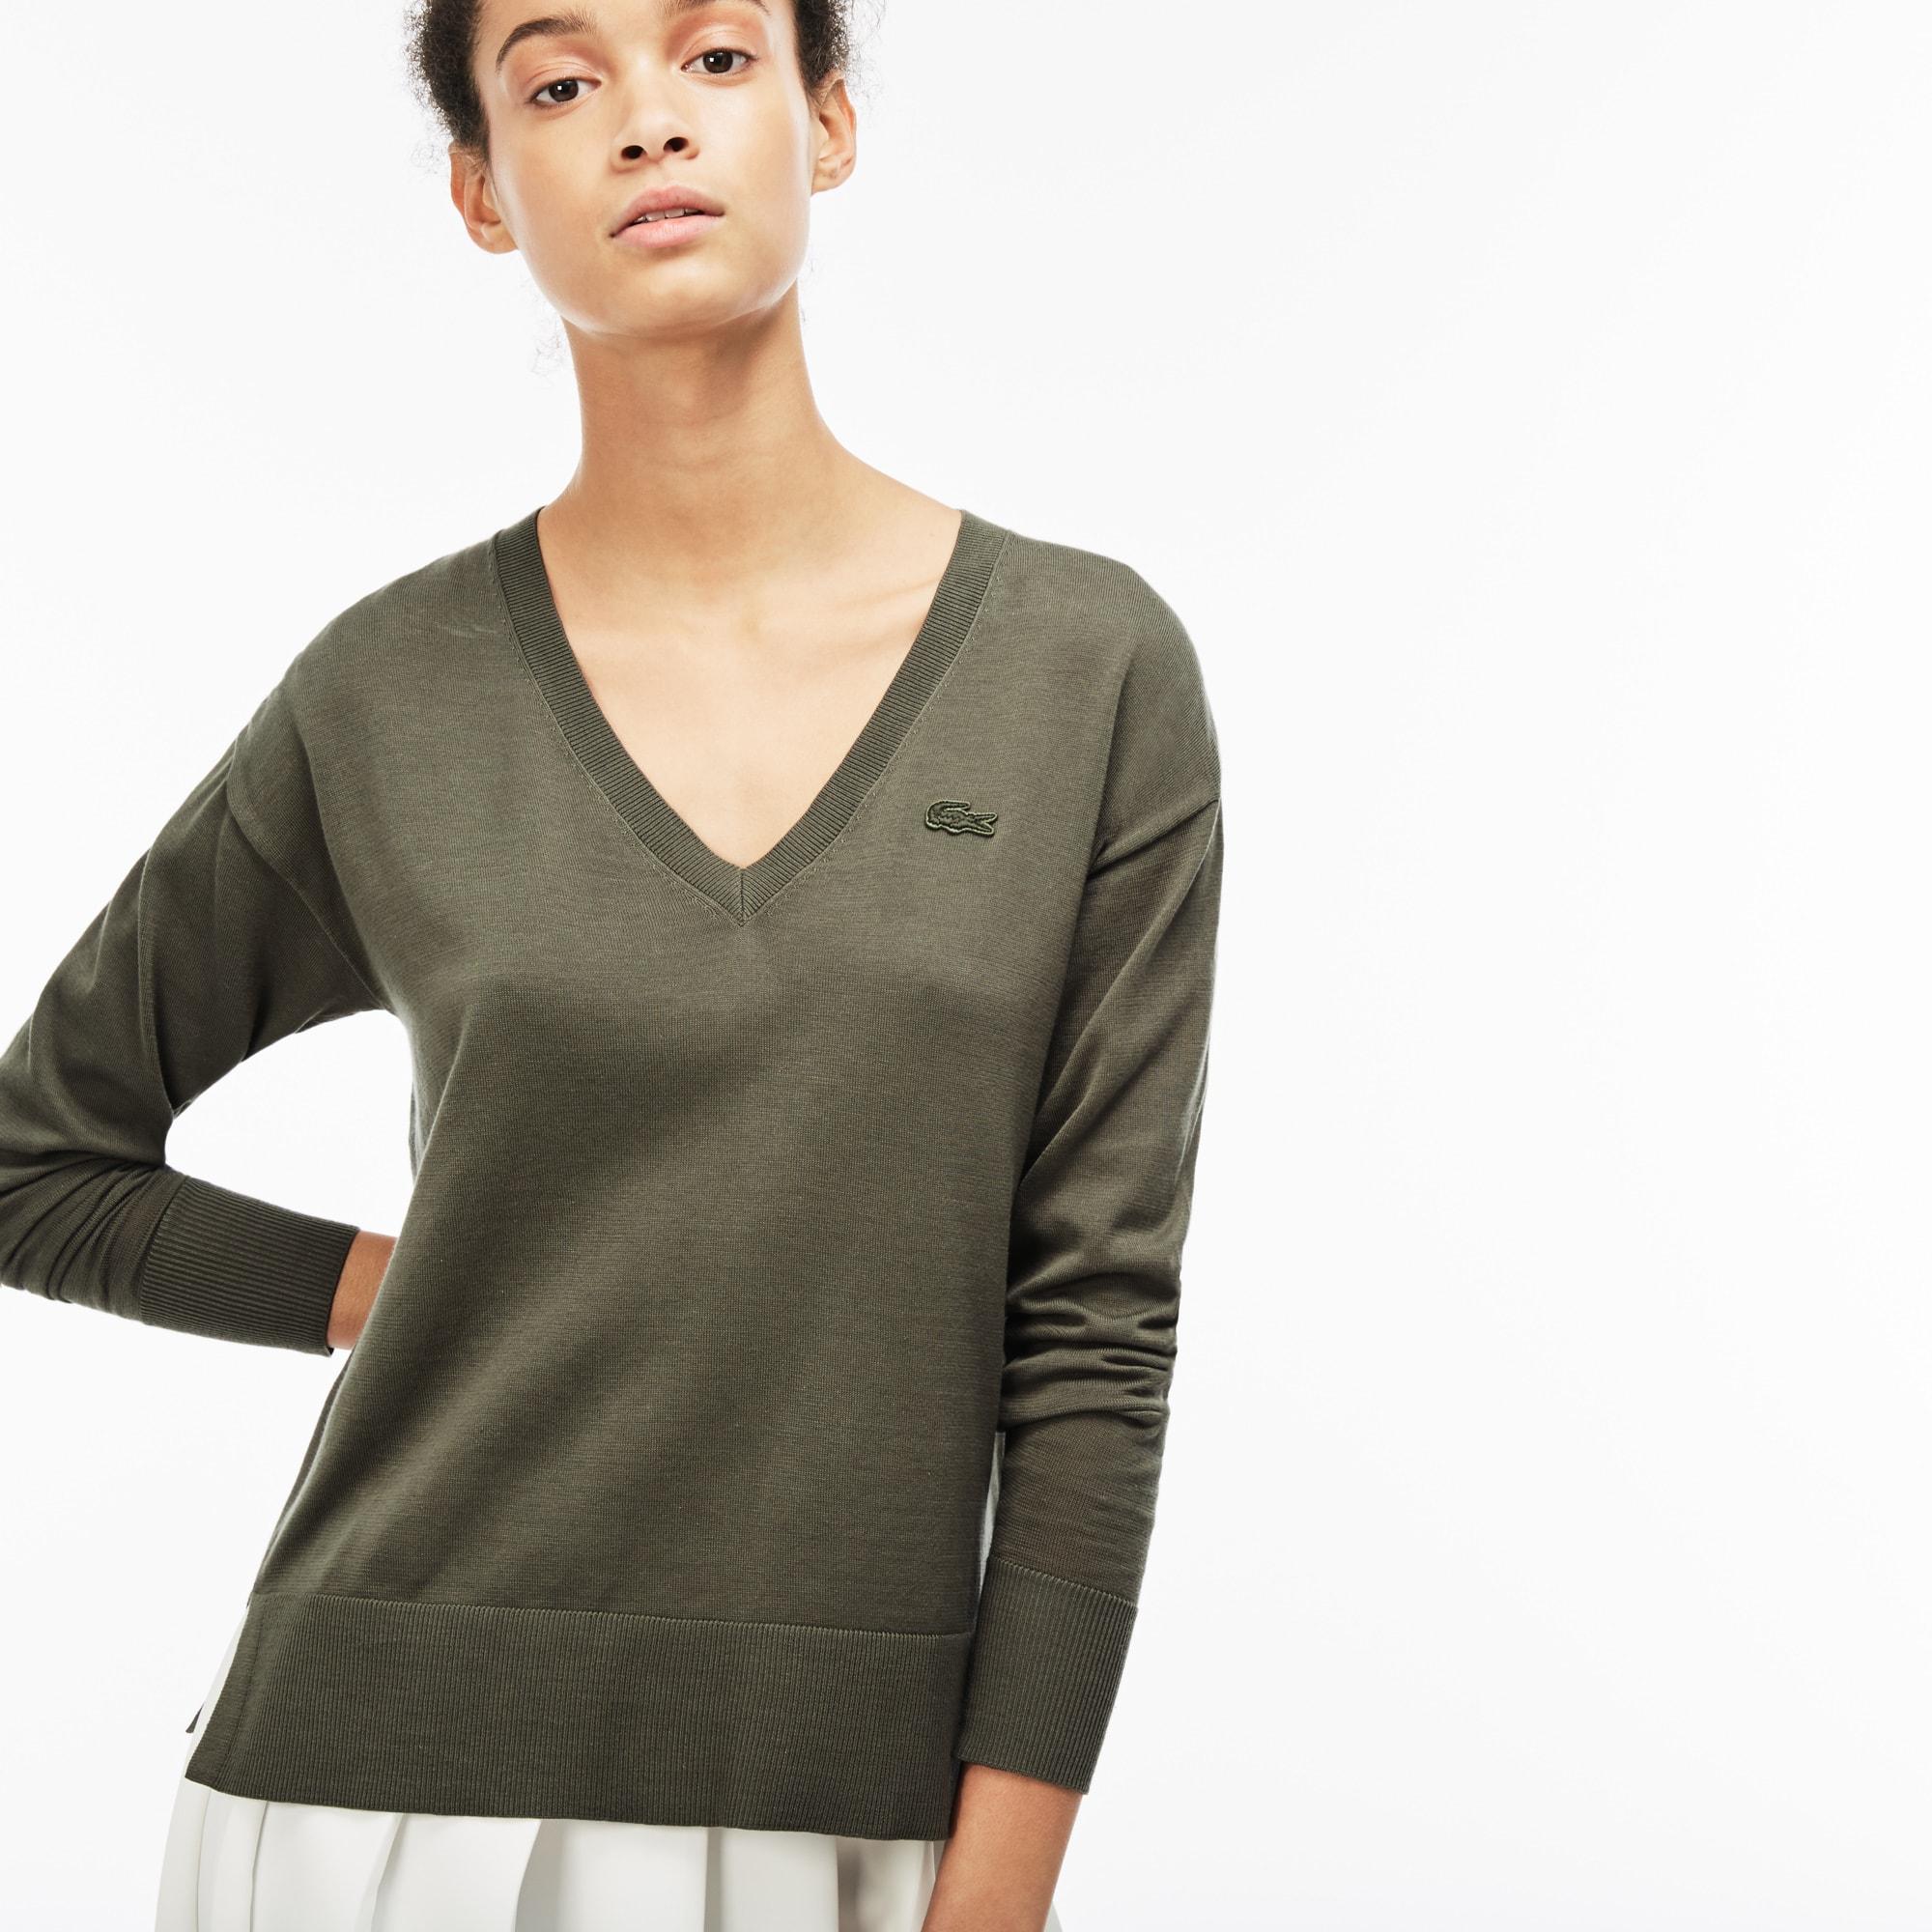 قميص نسائي مع ياقة V من جيرسيه قطنيّ